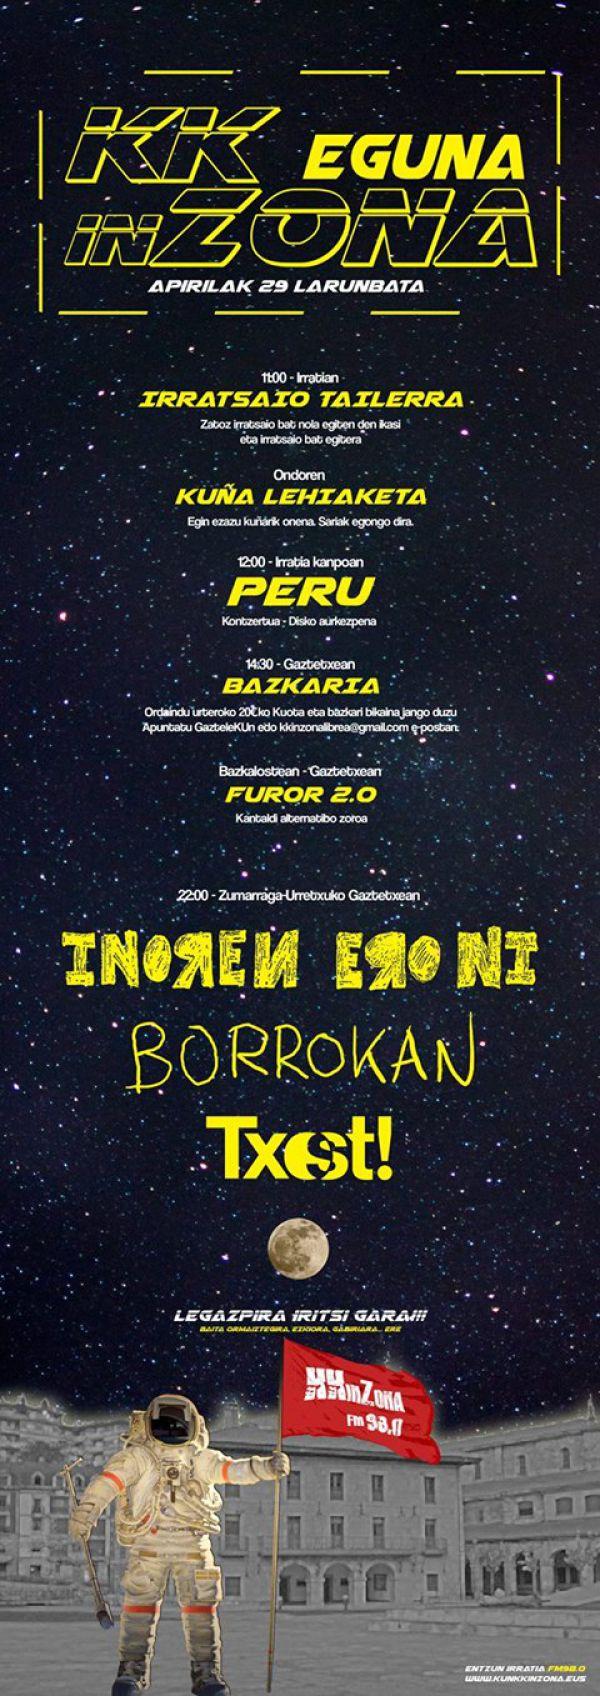 Borrokan + Inoren Ero Ni + Txost!